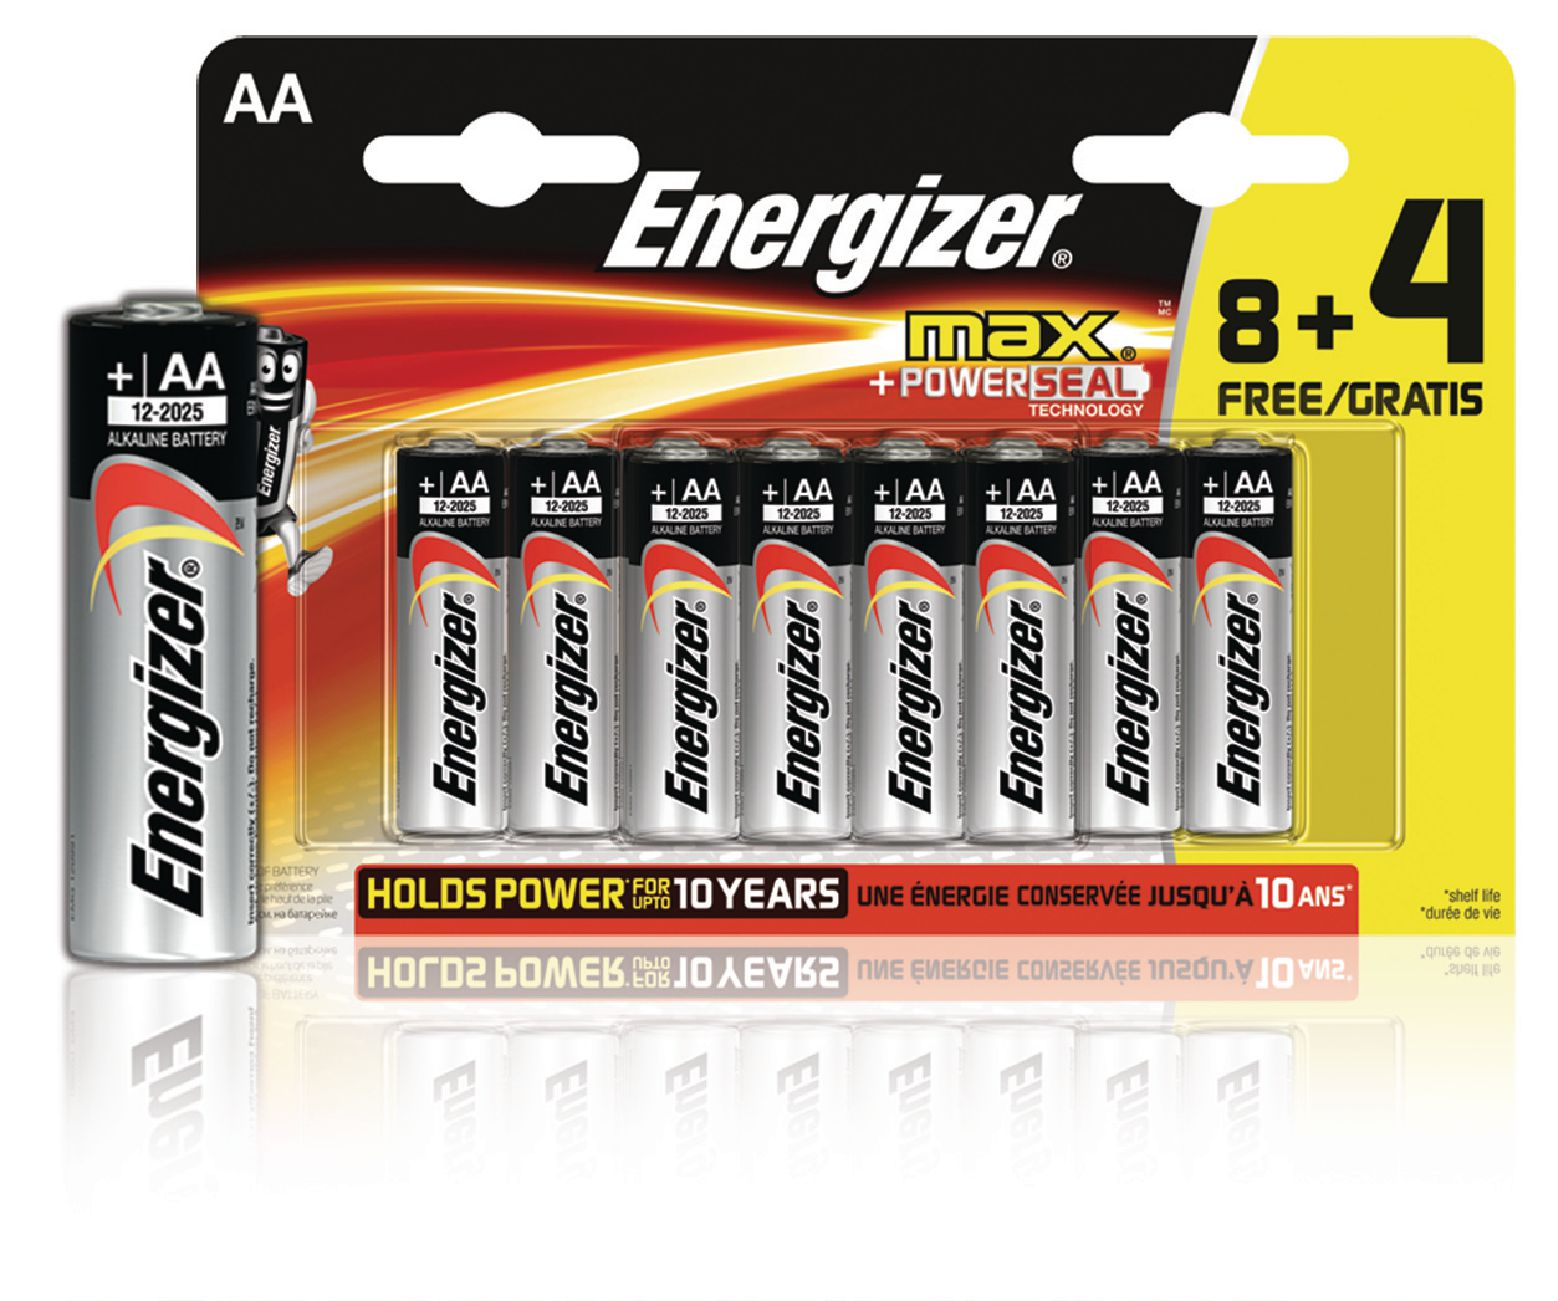 Alkalická baterie Energizer Max AA 1.5V, 12ks, EN-E300115600